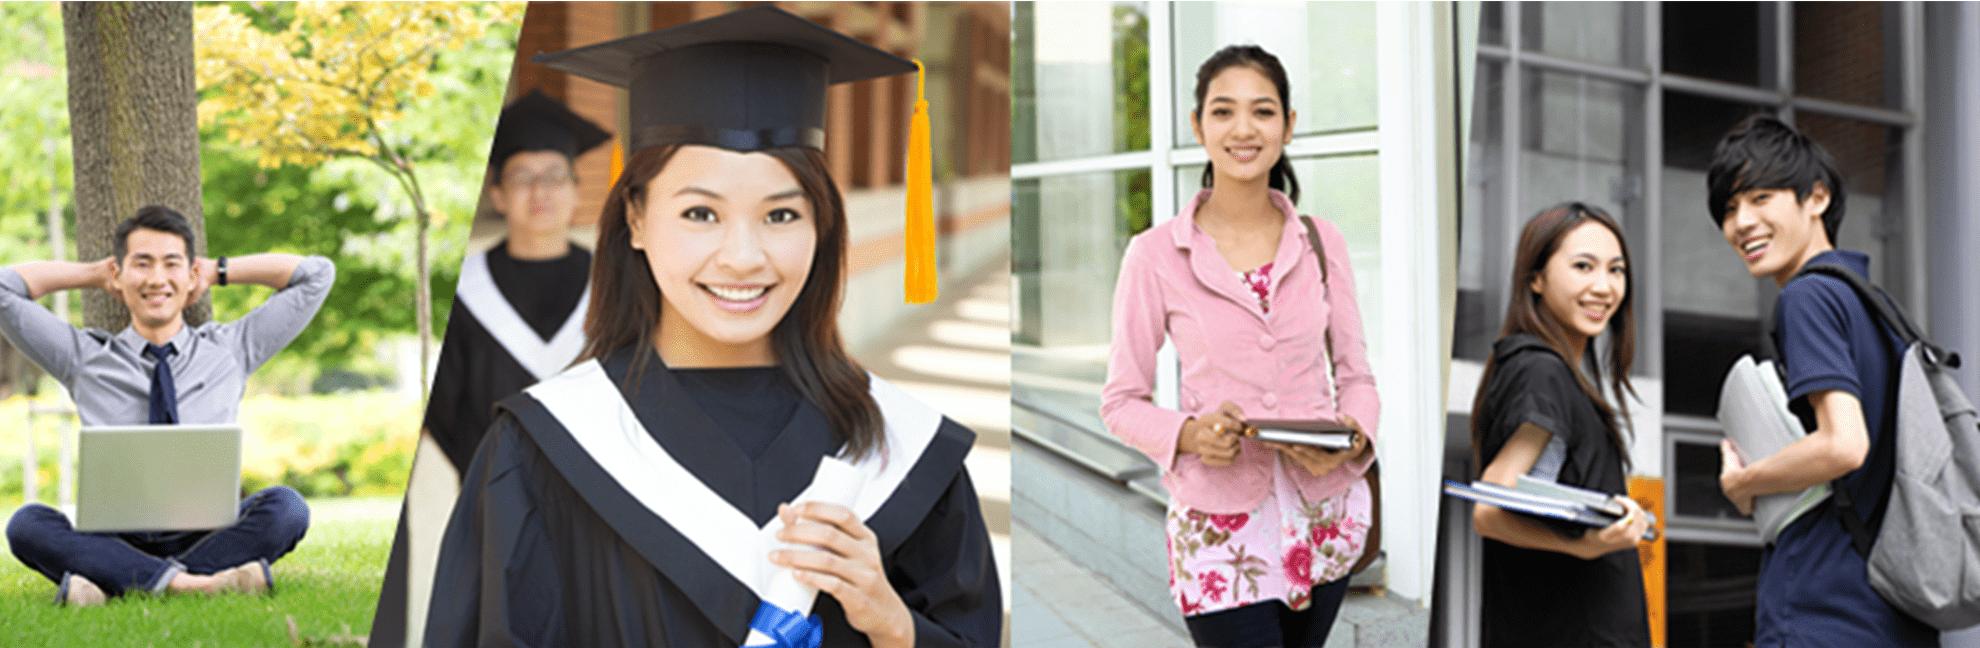 Malaysia University Assignment Help, Tutor Service Malaysia